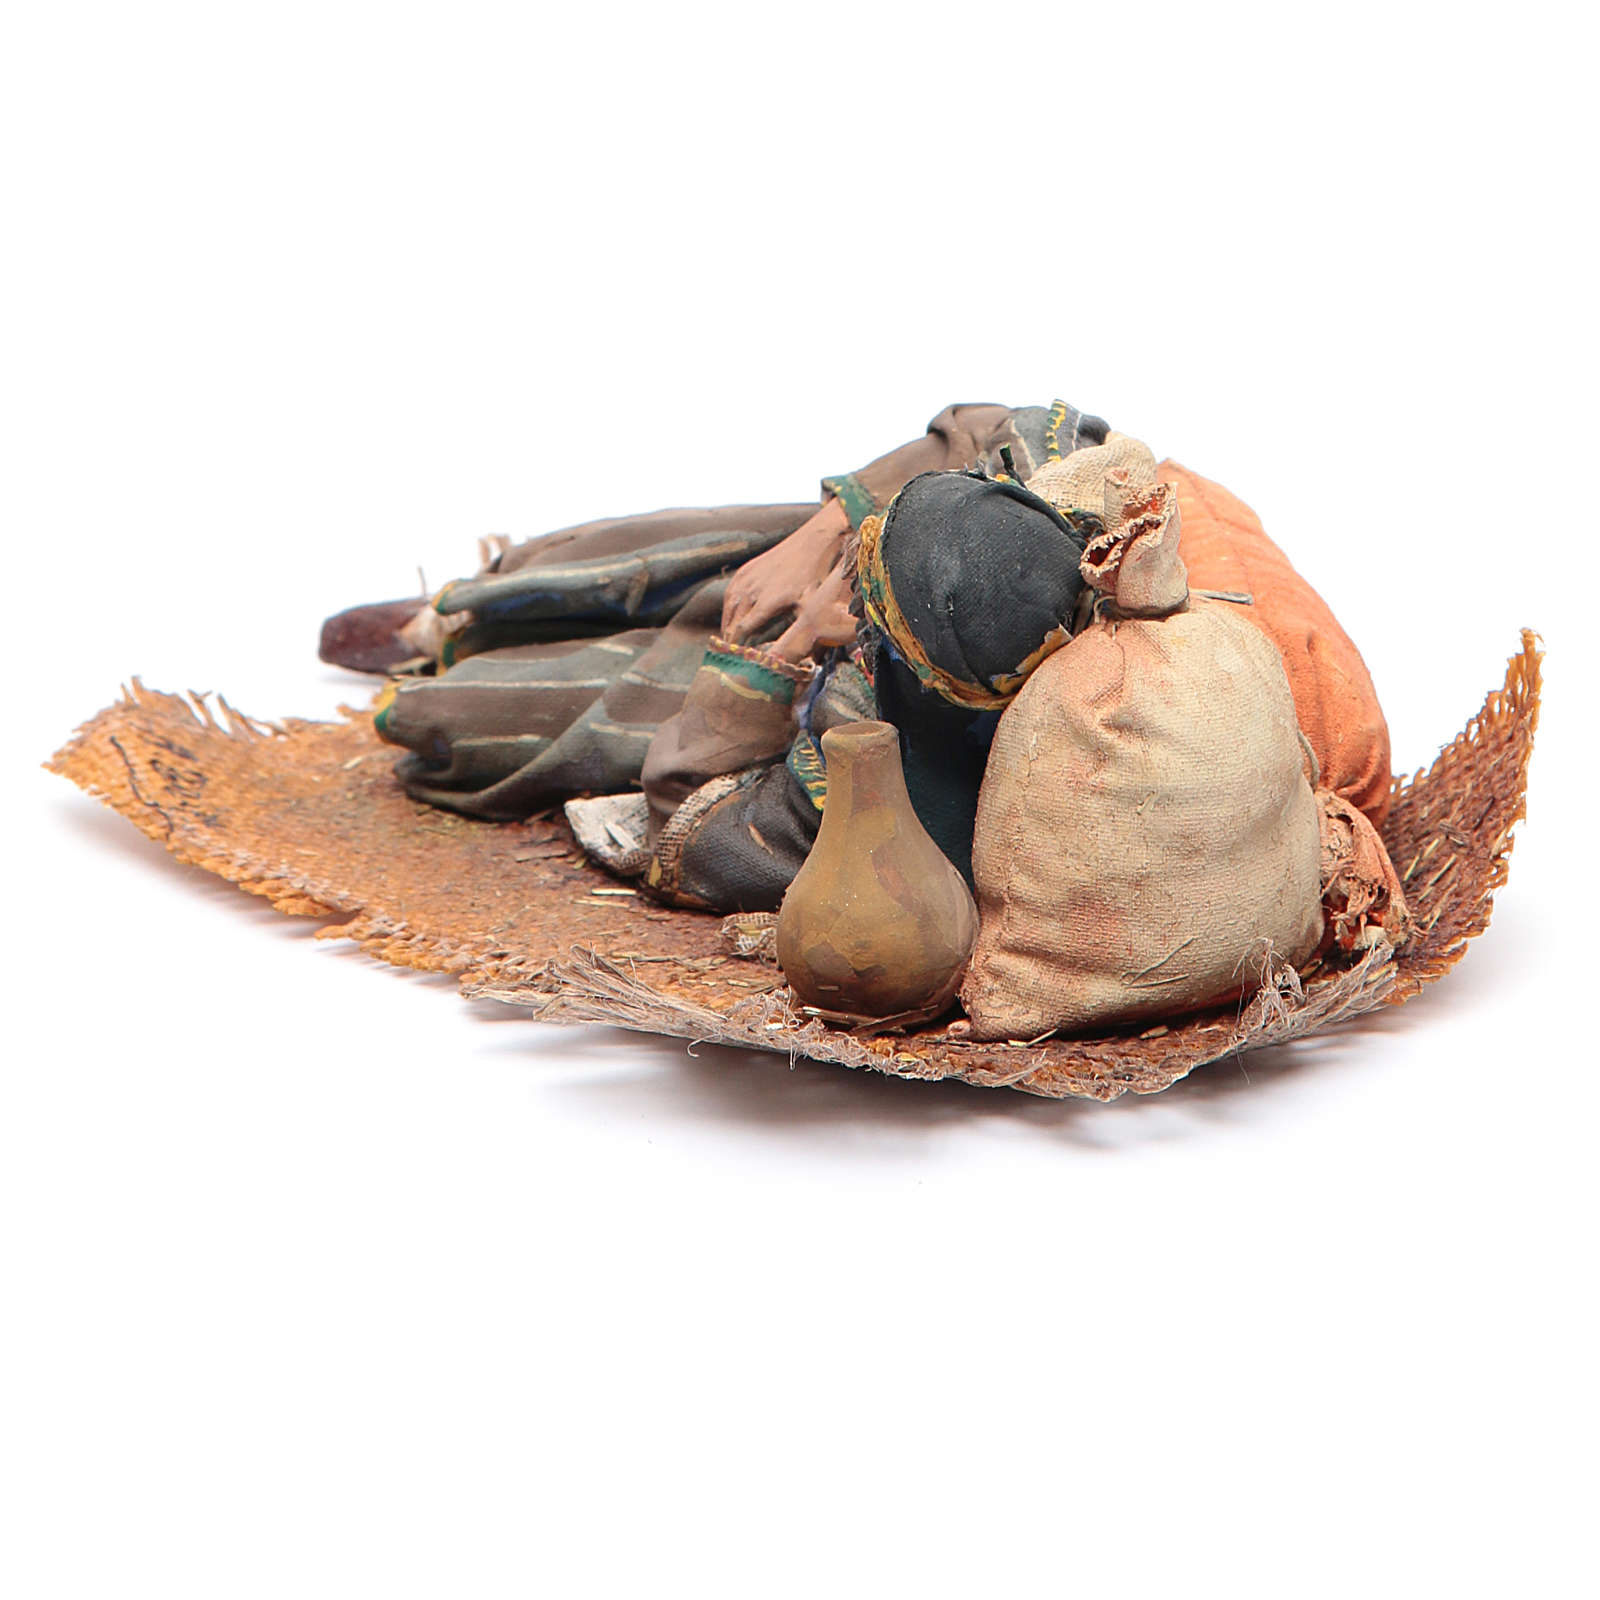 Pastore dormiente sul fianco 18 cm Angela Tripi 4